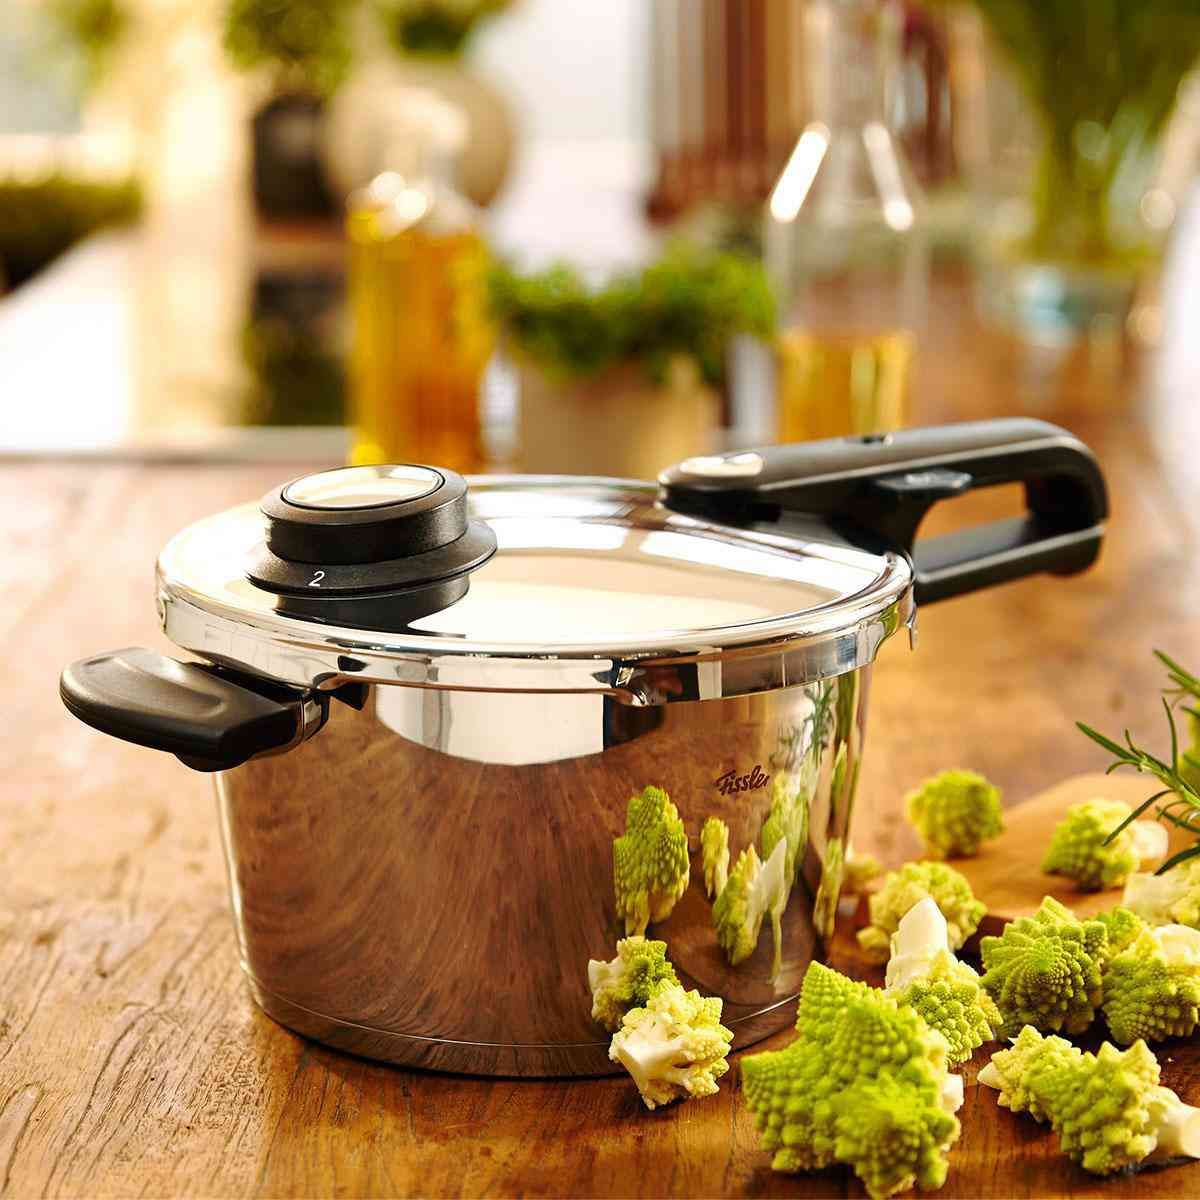 vitavit premium pressure cooker 26 cm / 10 ltr.